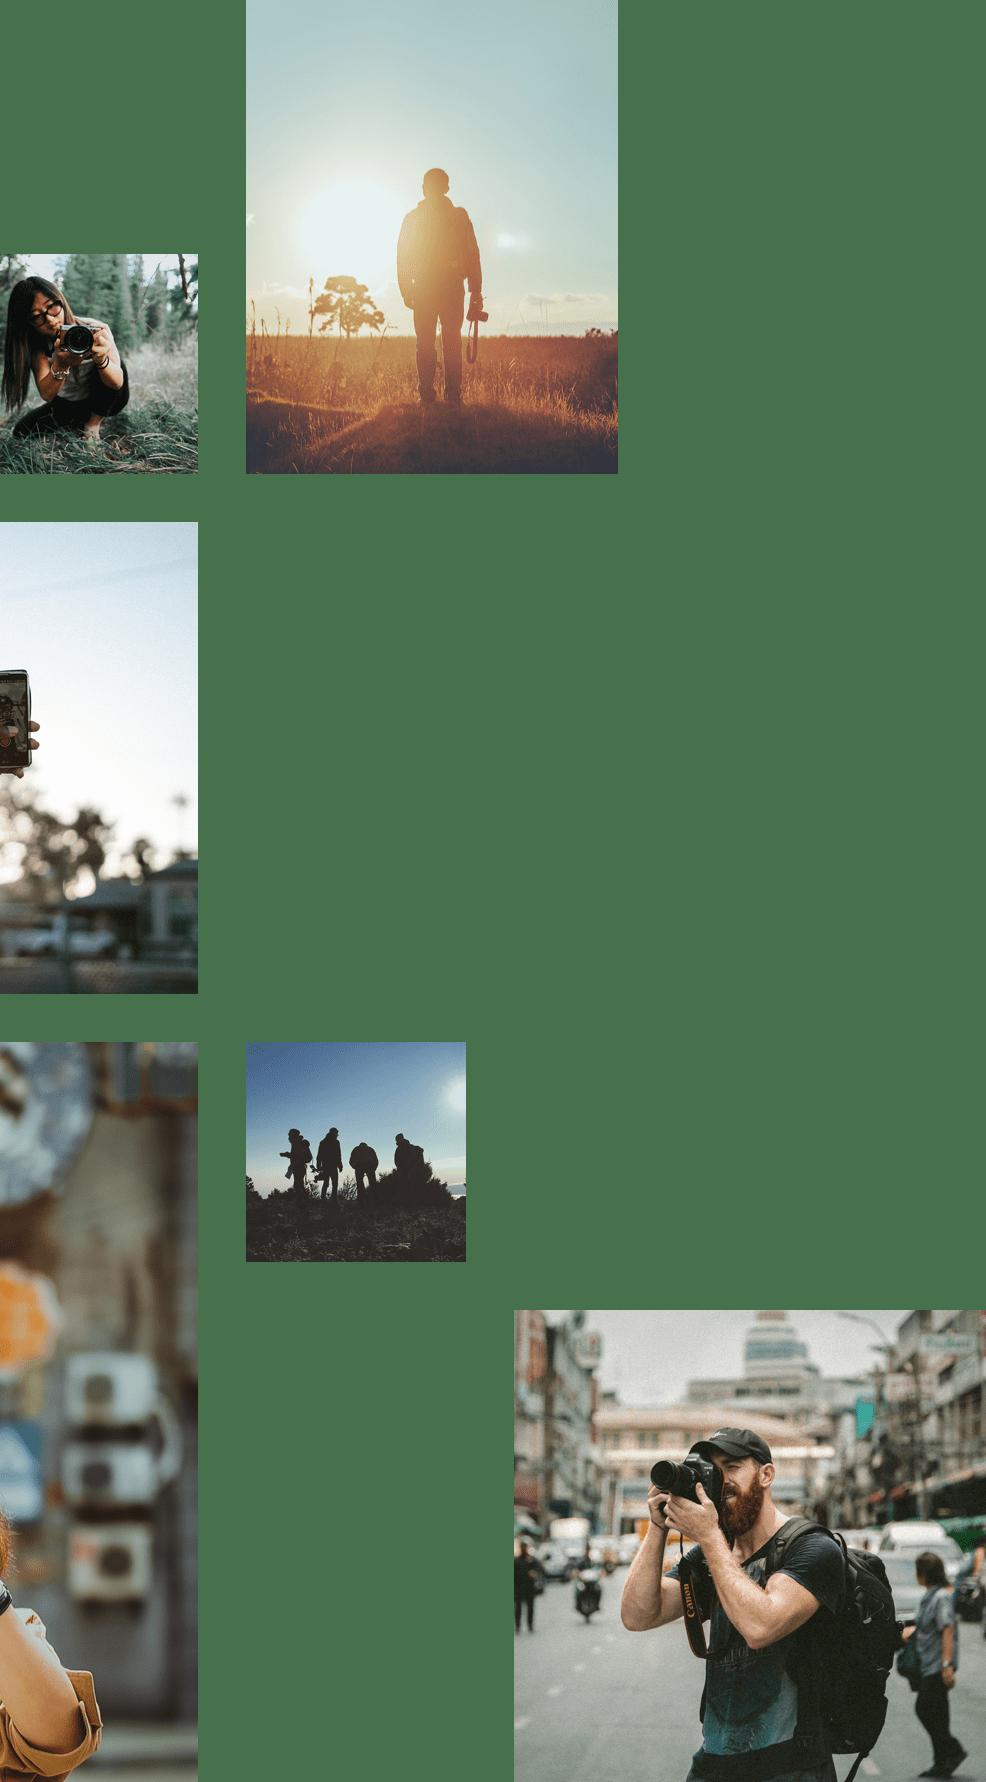 Unsplash photographers